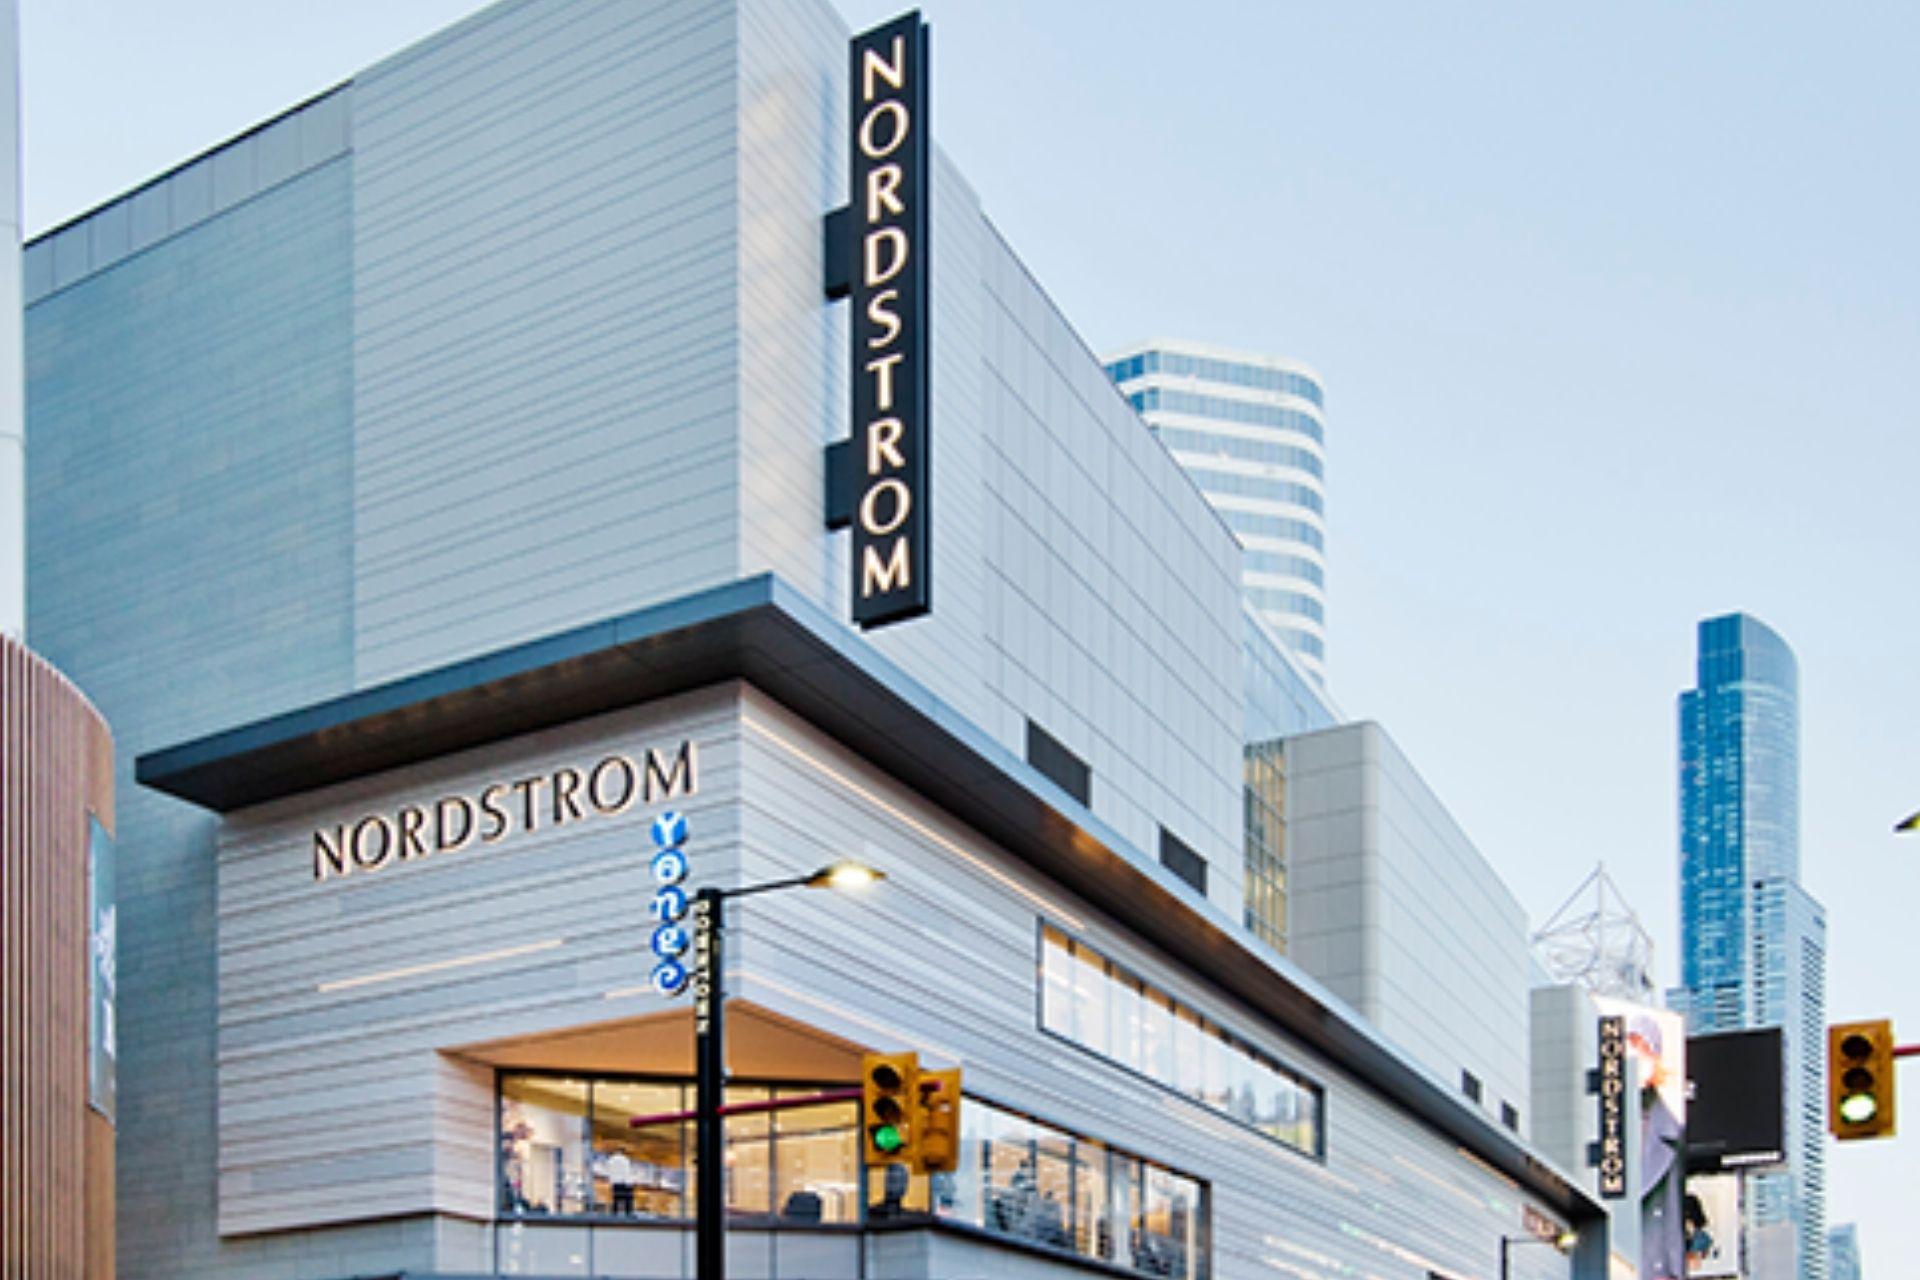 Nordstrom Anniversary Sale Spotlights Home Brands